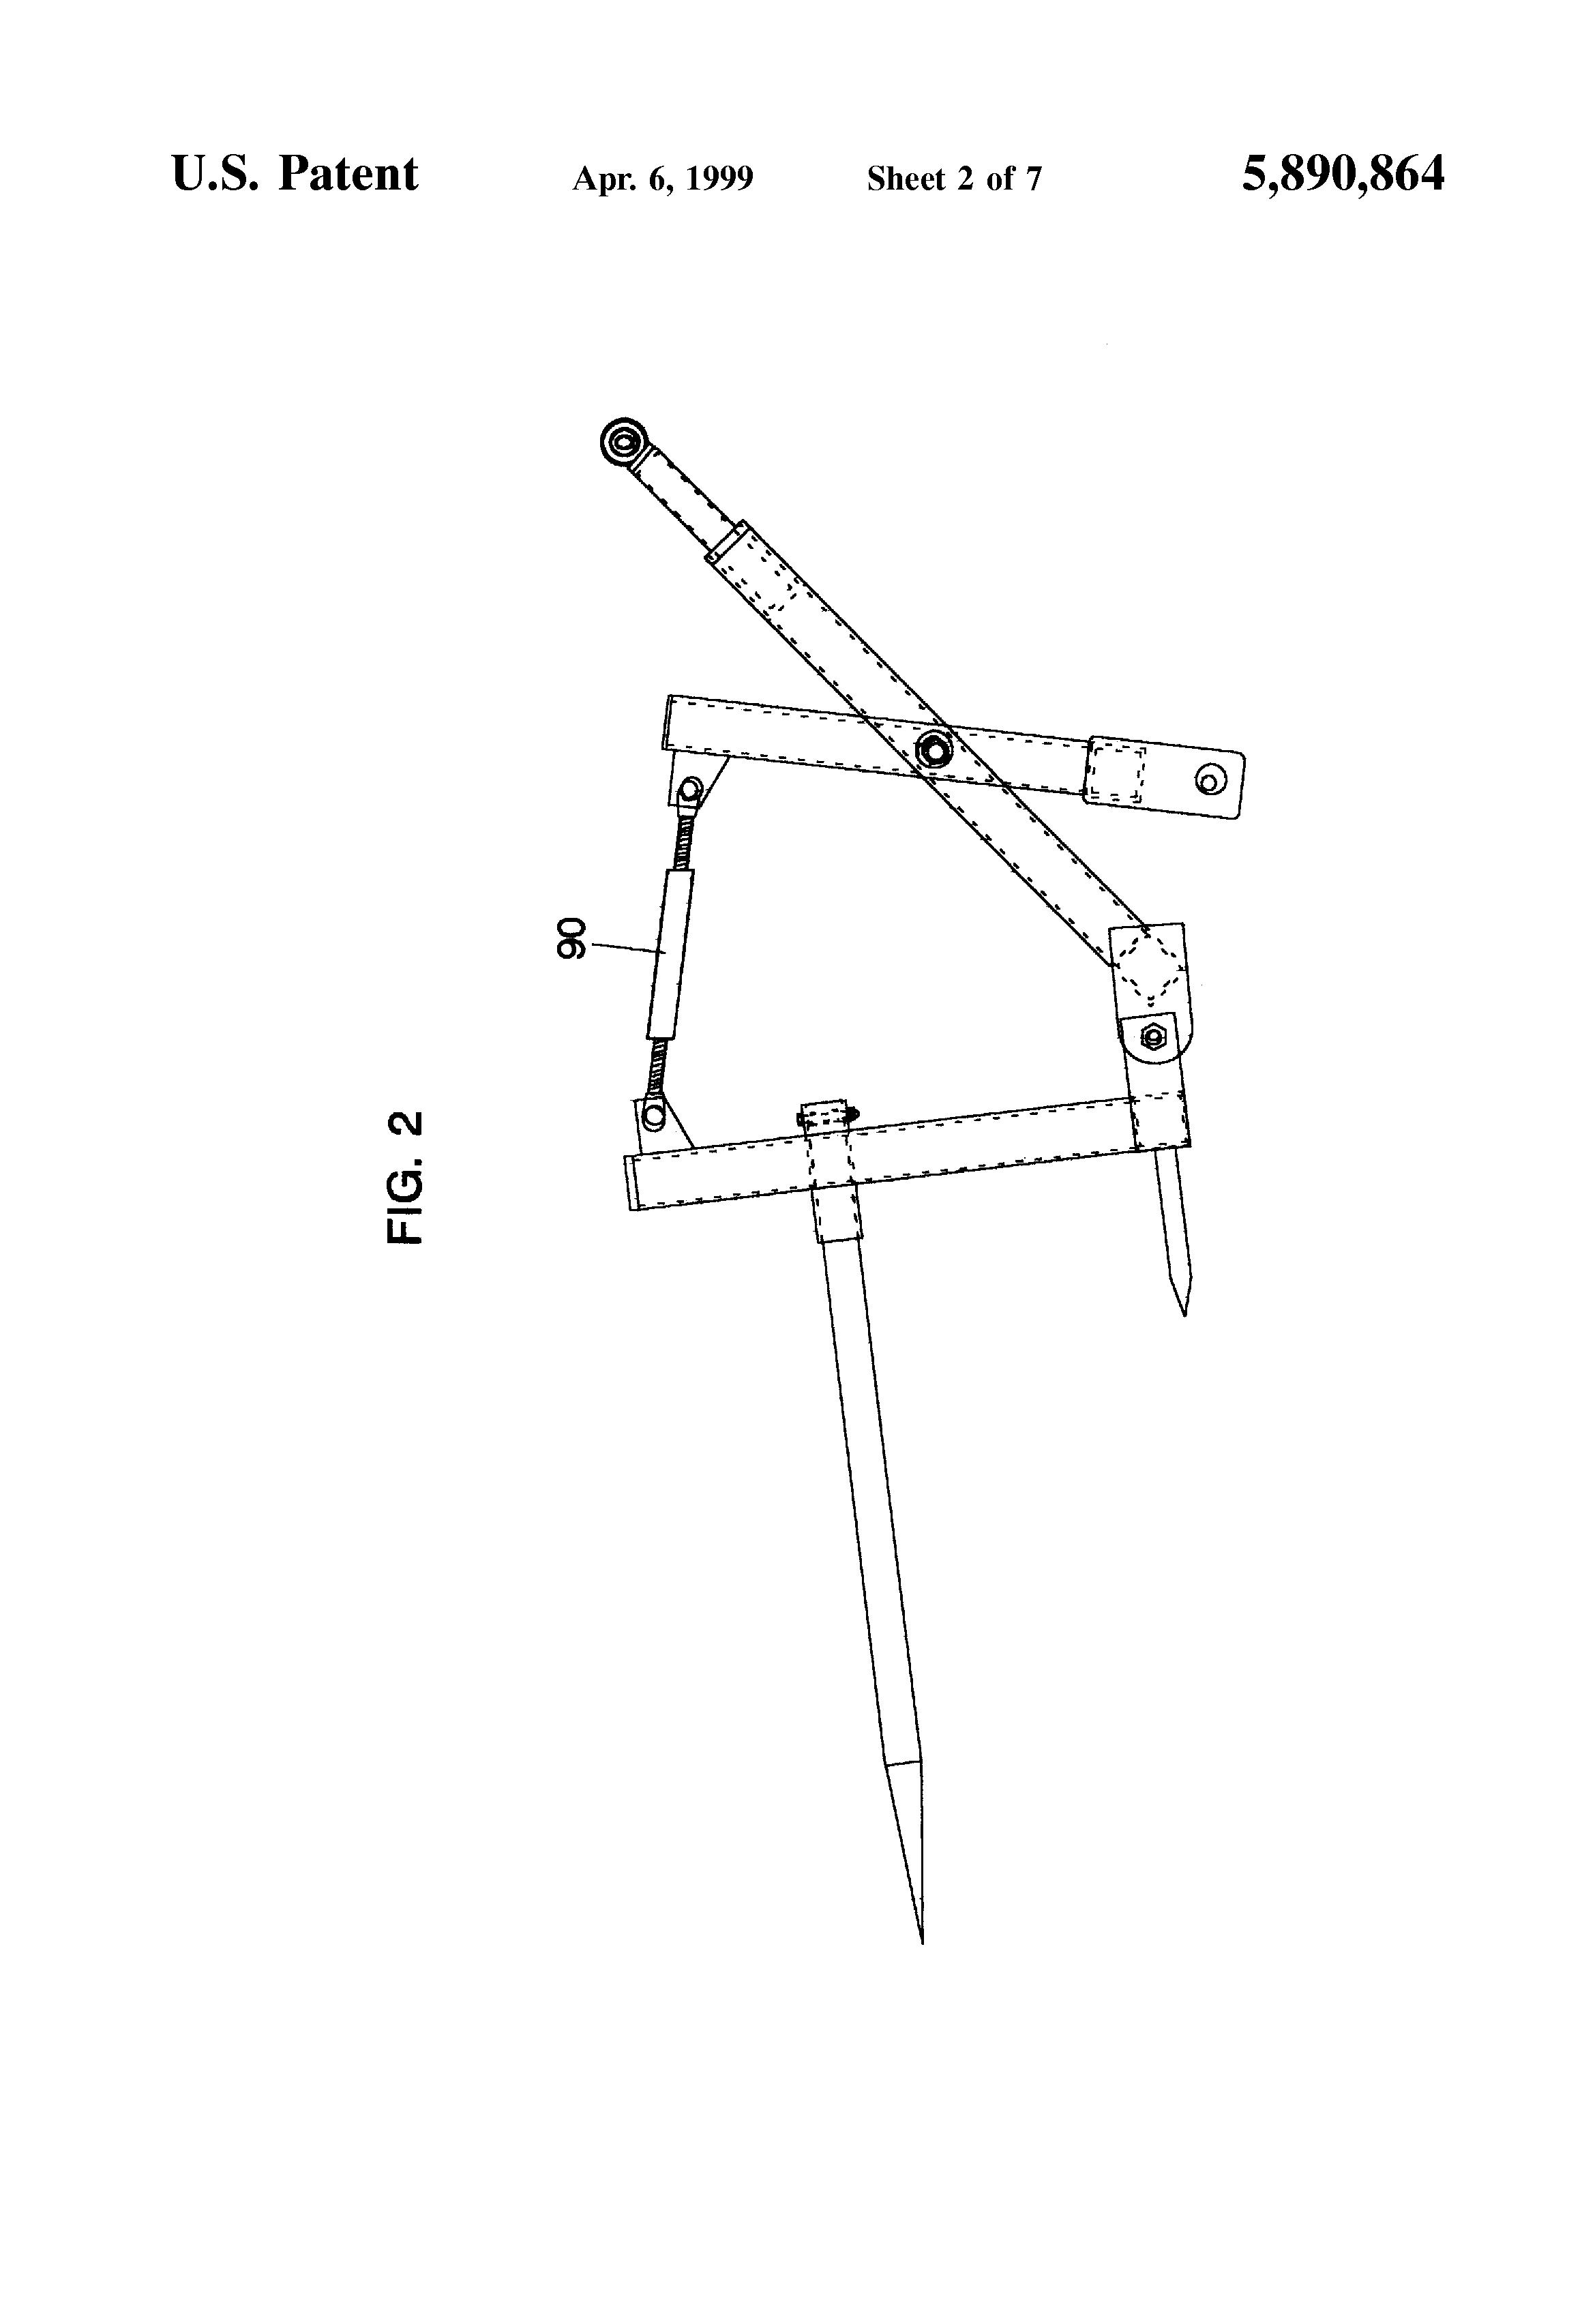 Hay Scissor Lift : Patent us heavy duty hay scissors lift google